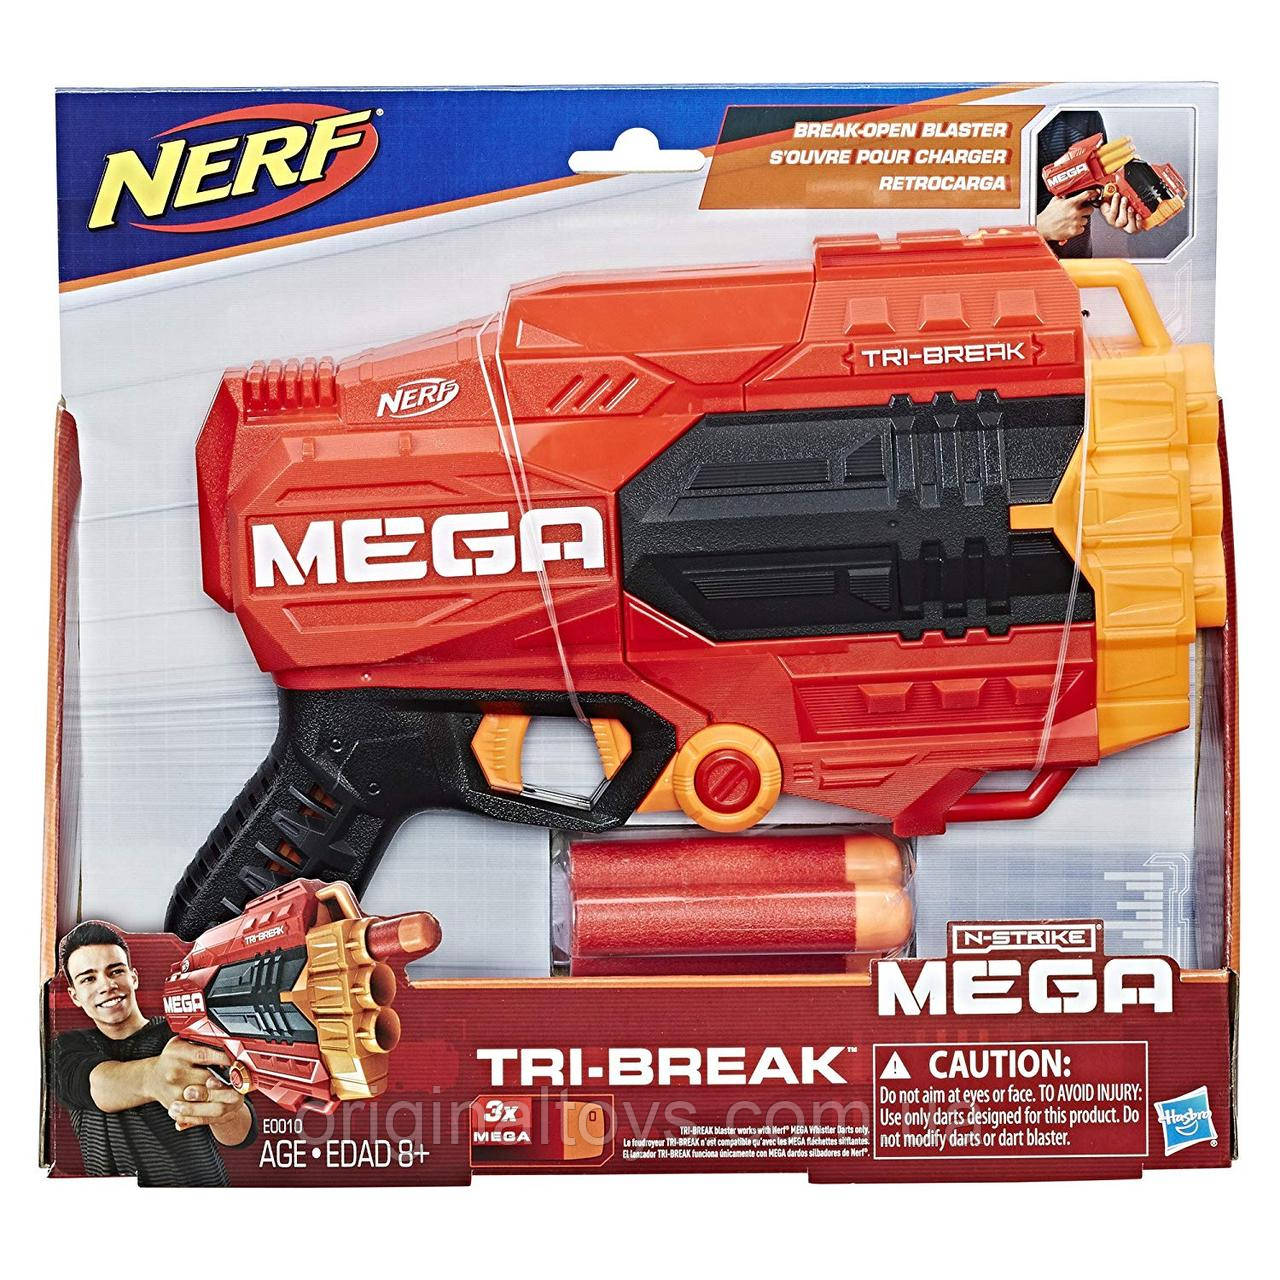 Бластер Nerf Нерф Mega Tri-Break Hasbro E0010